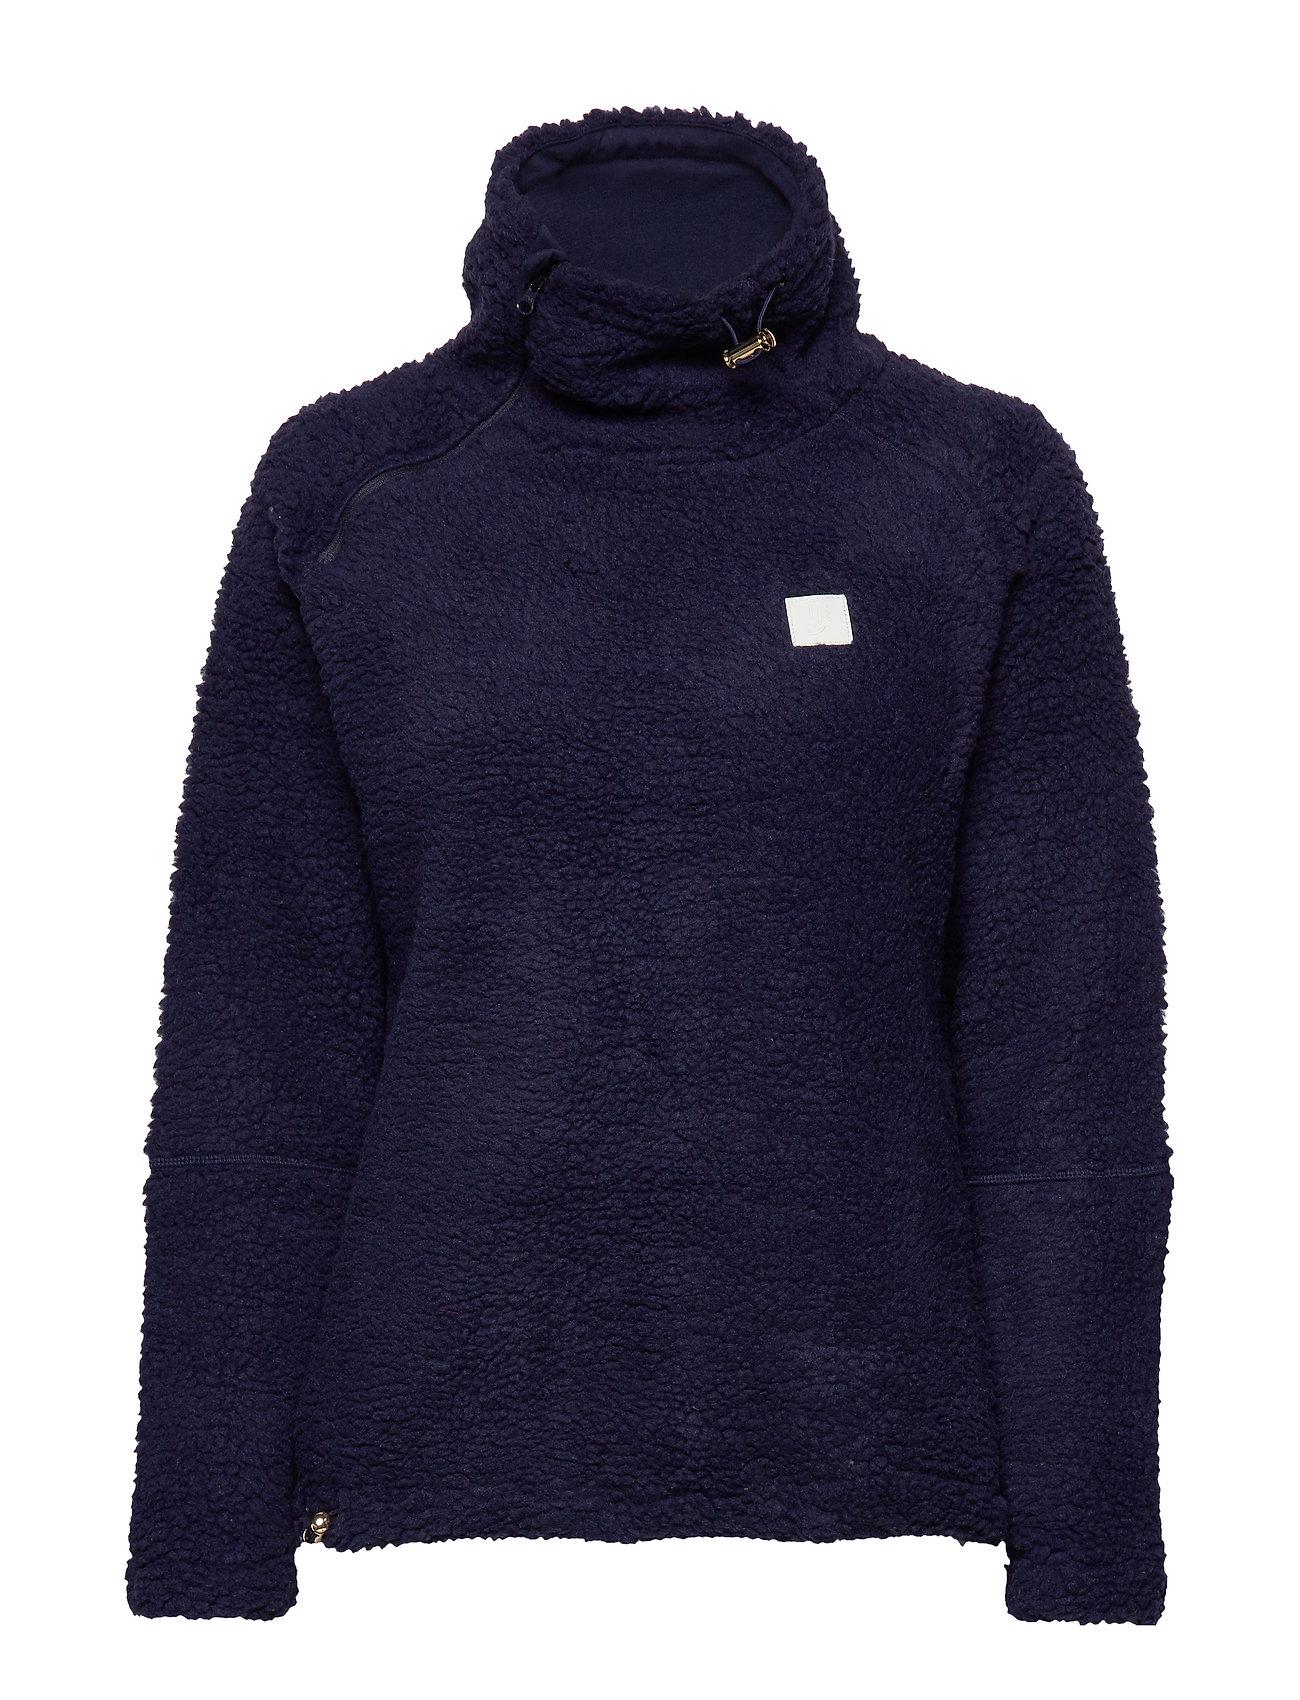 Johaug Crux Pile Fleece - EVEBL